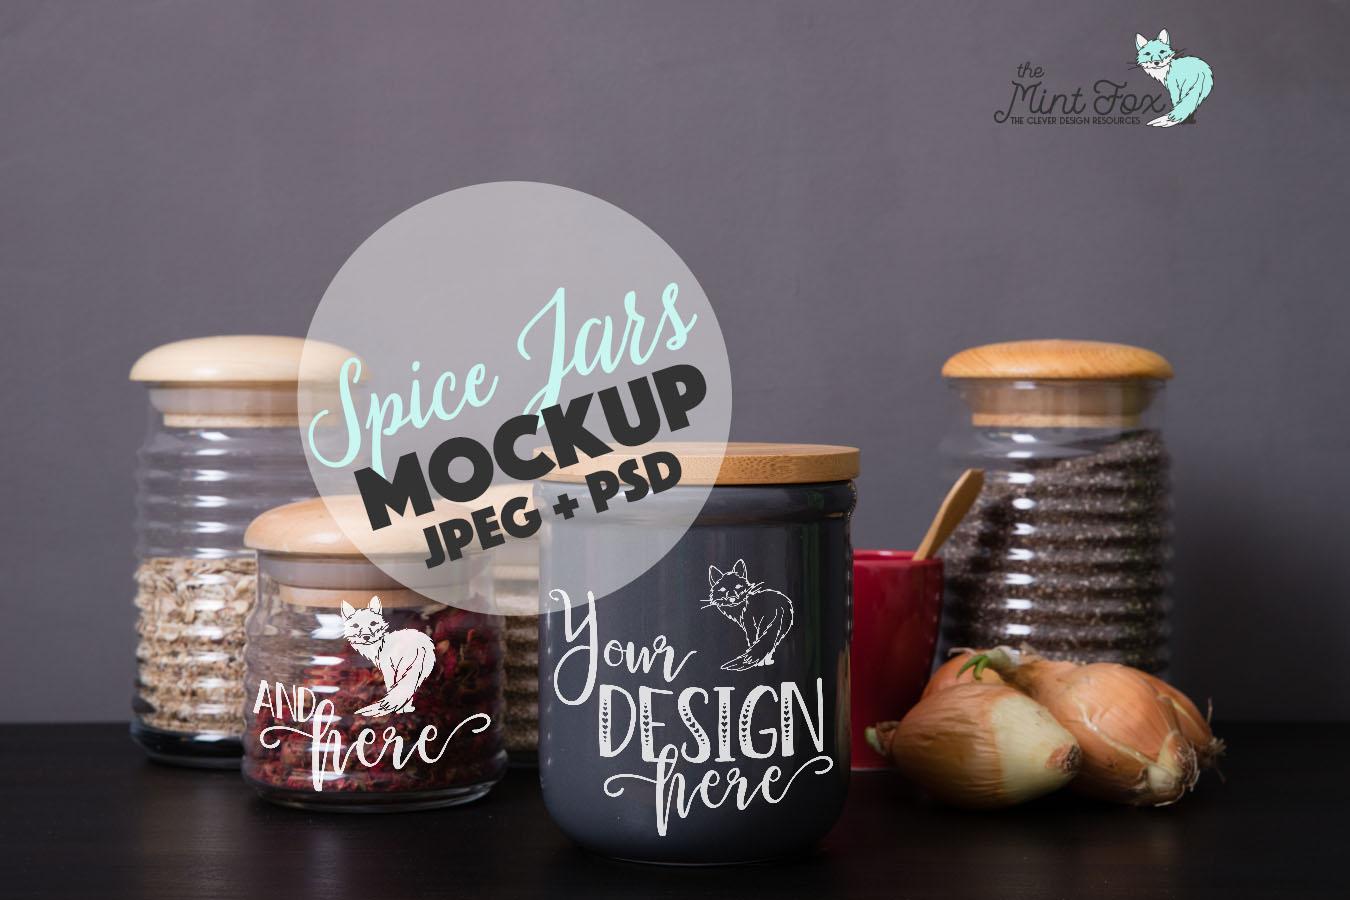 Spice Jars Mockup | PSD & JPG Kitchen Jar Mock Up example image 1